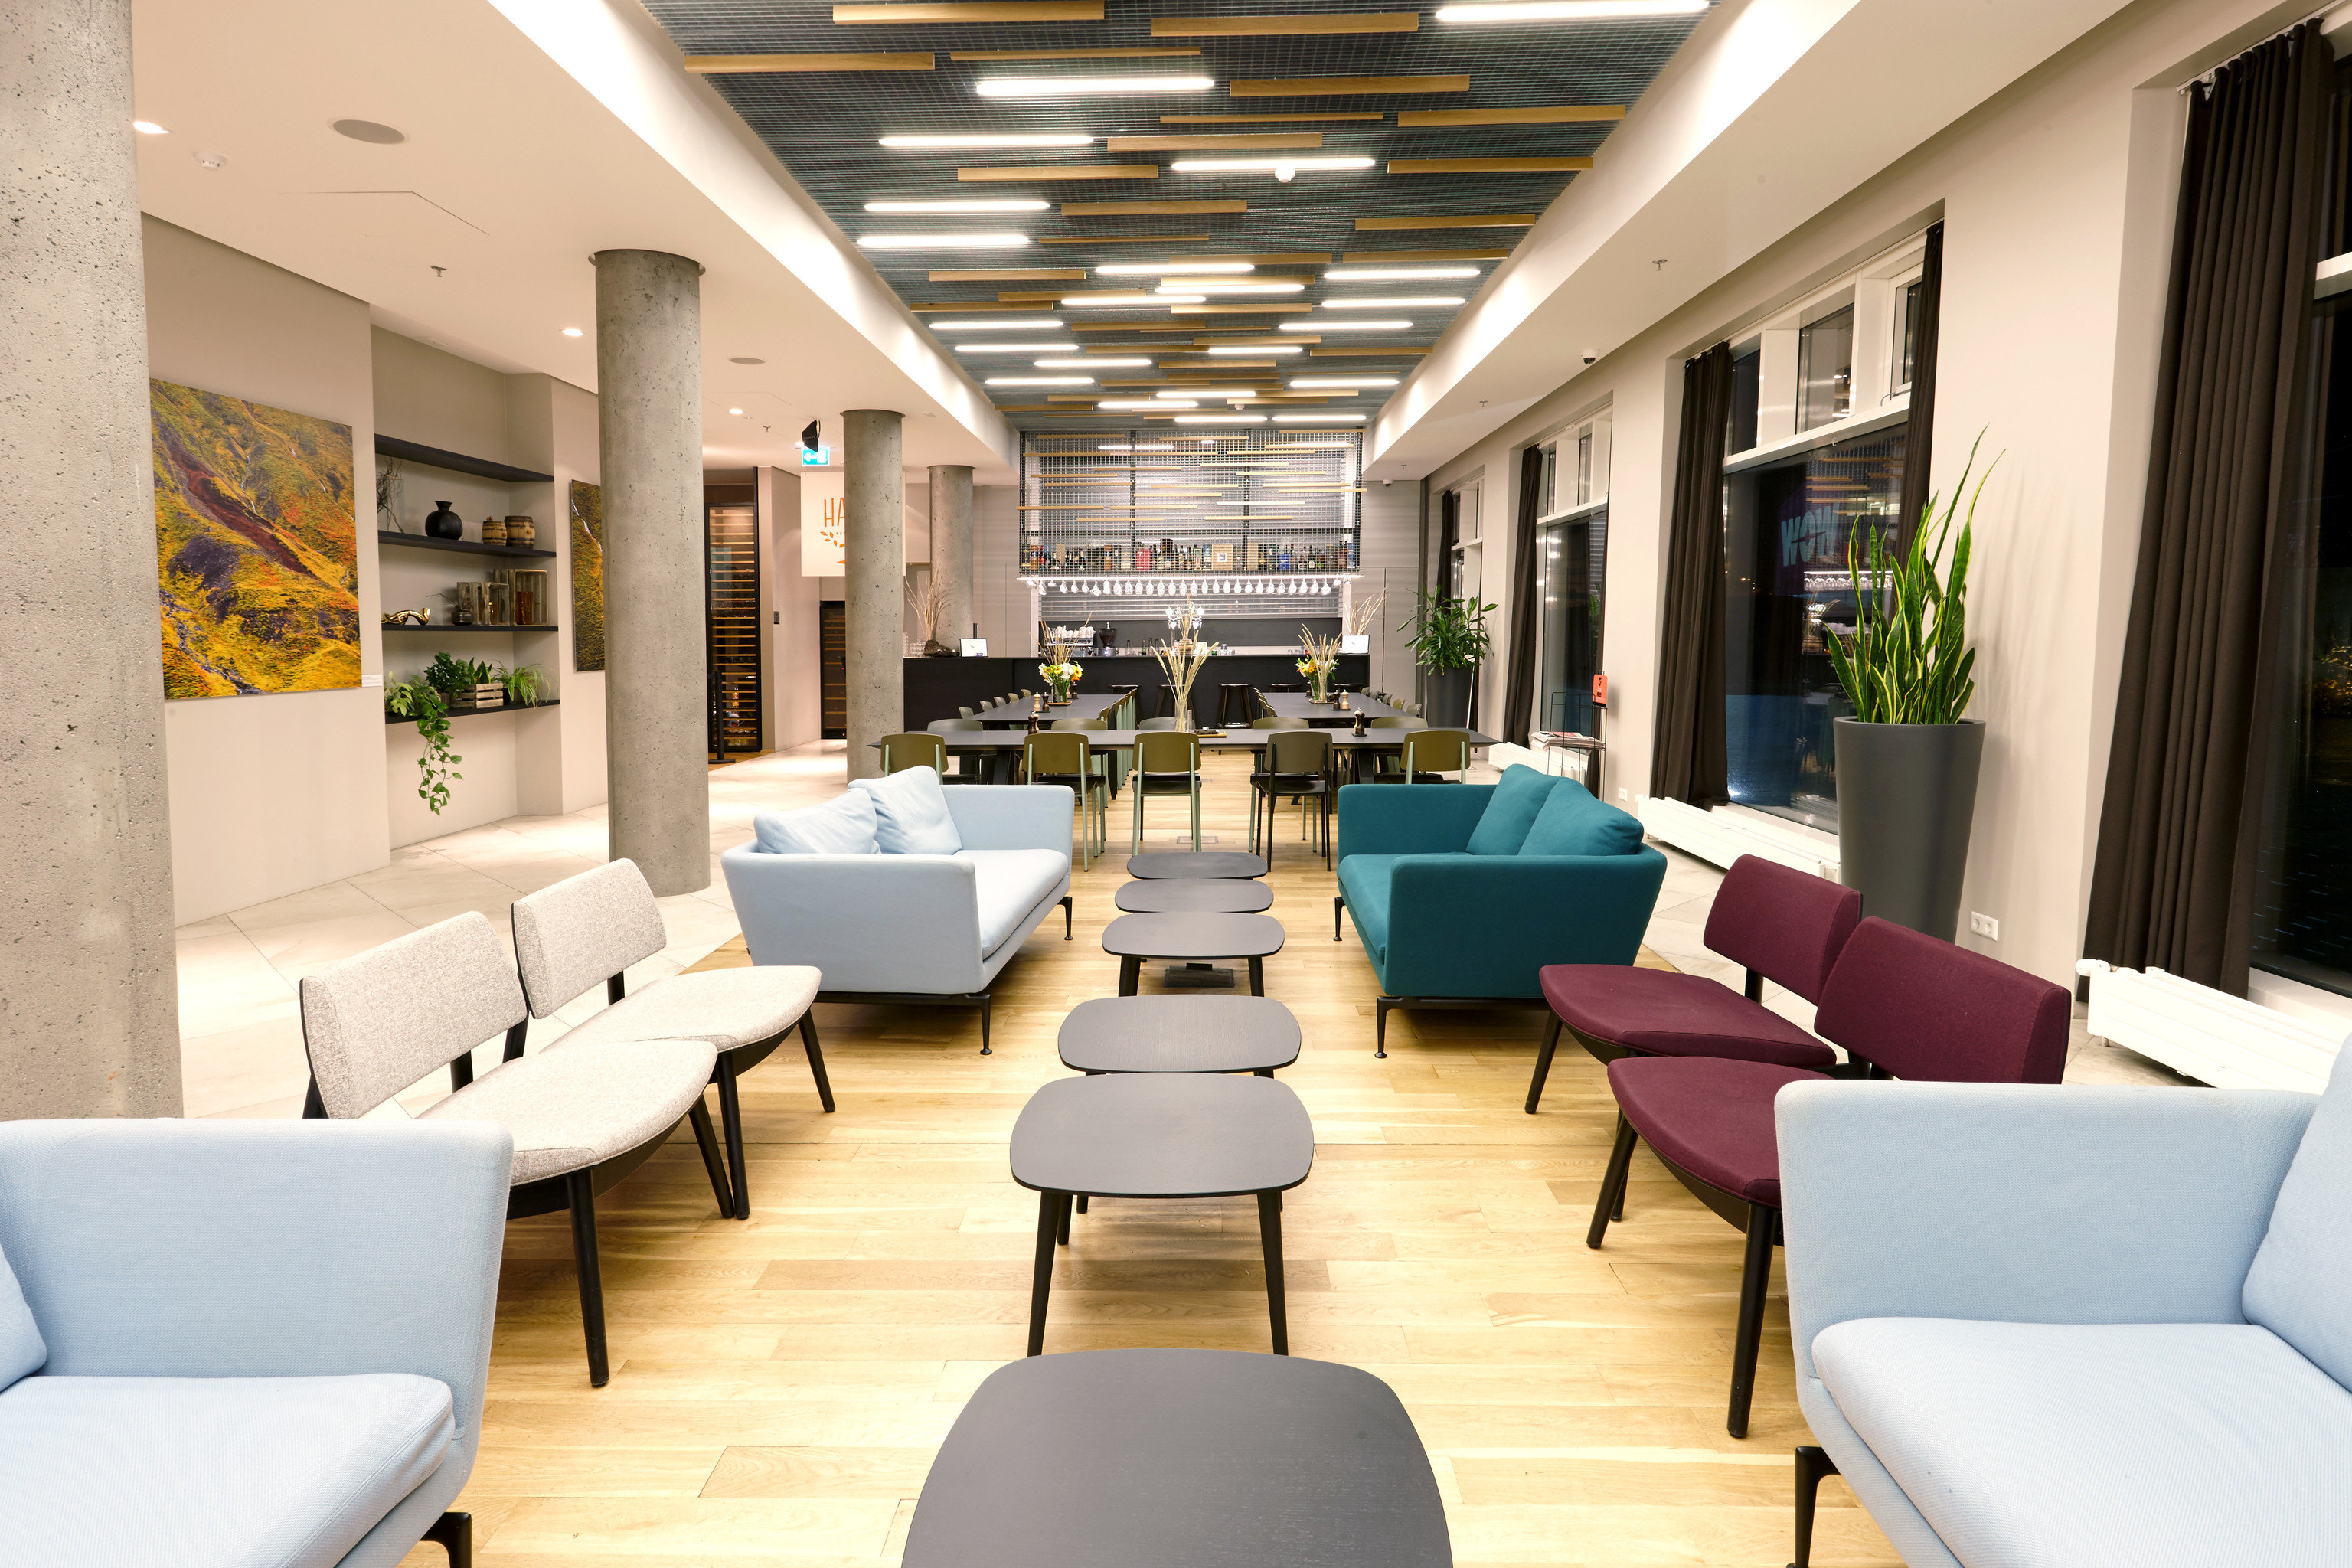 Boutique Hotels Hotels Iceland Reykjavík floor room indoor Living sofa window chair furniture interior design Lobby area